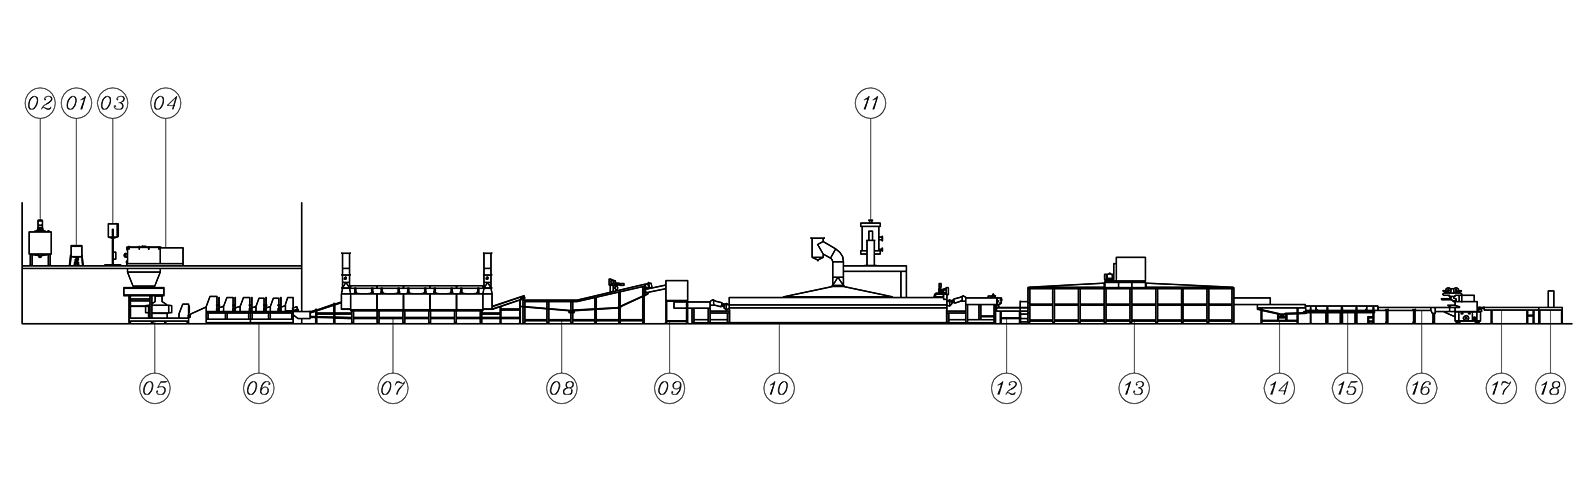 Lini Produksi Mie Instan Kantong Otomatis (Mie Tanpa Lipat) - LTI-500 | Lini Produksi Mie Instan Tas Otomatis - Mie Non Lipat